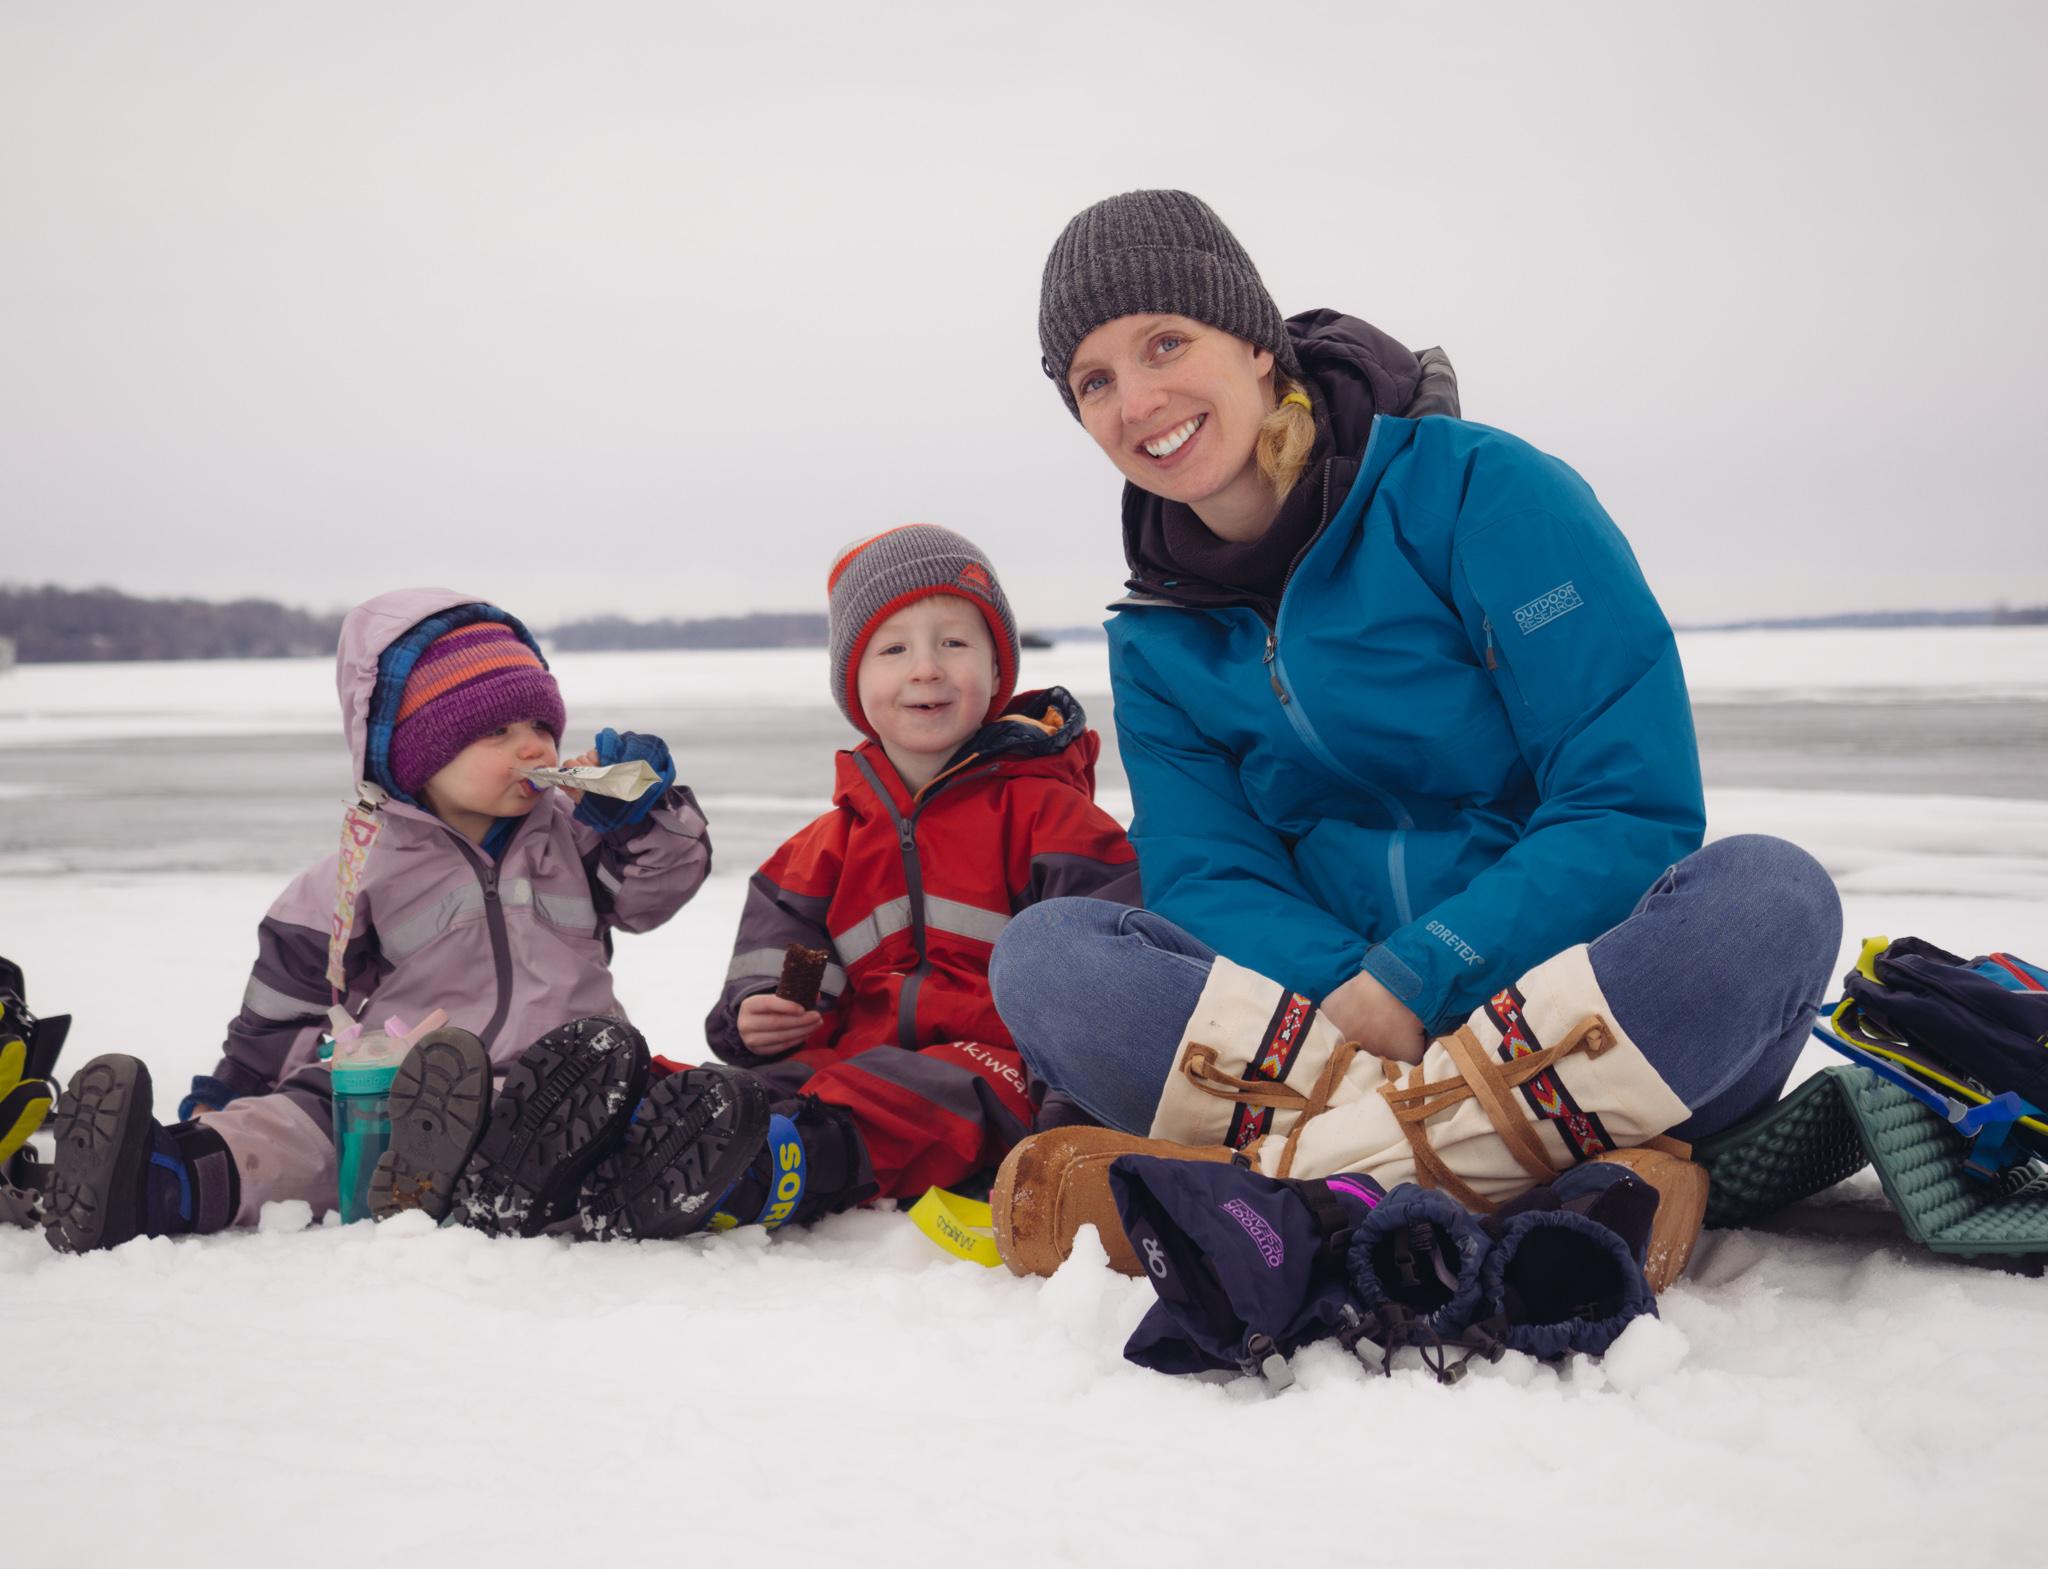 As I Walked Onto Ice I Kept In Mind >> A Walk On Lake Minnetonka We Found Adventure